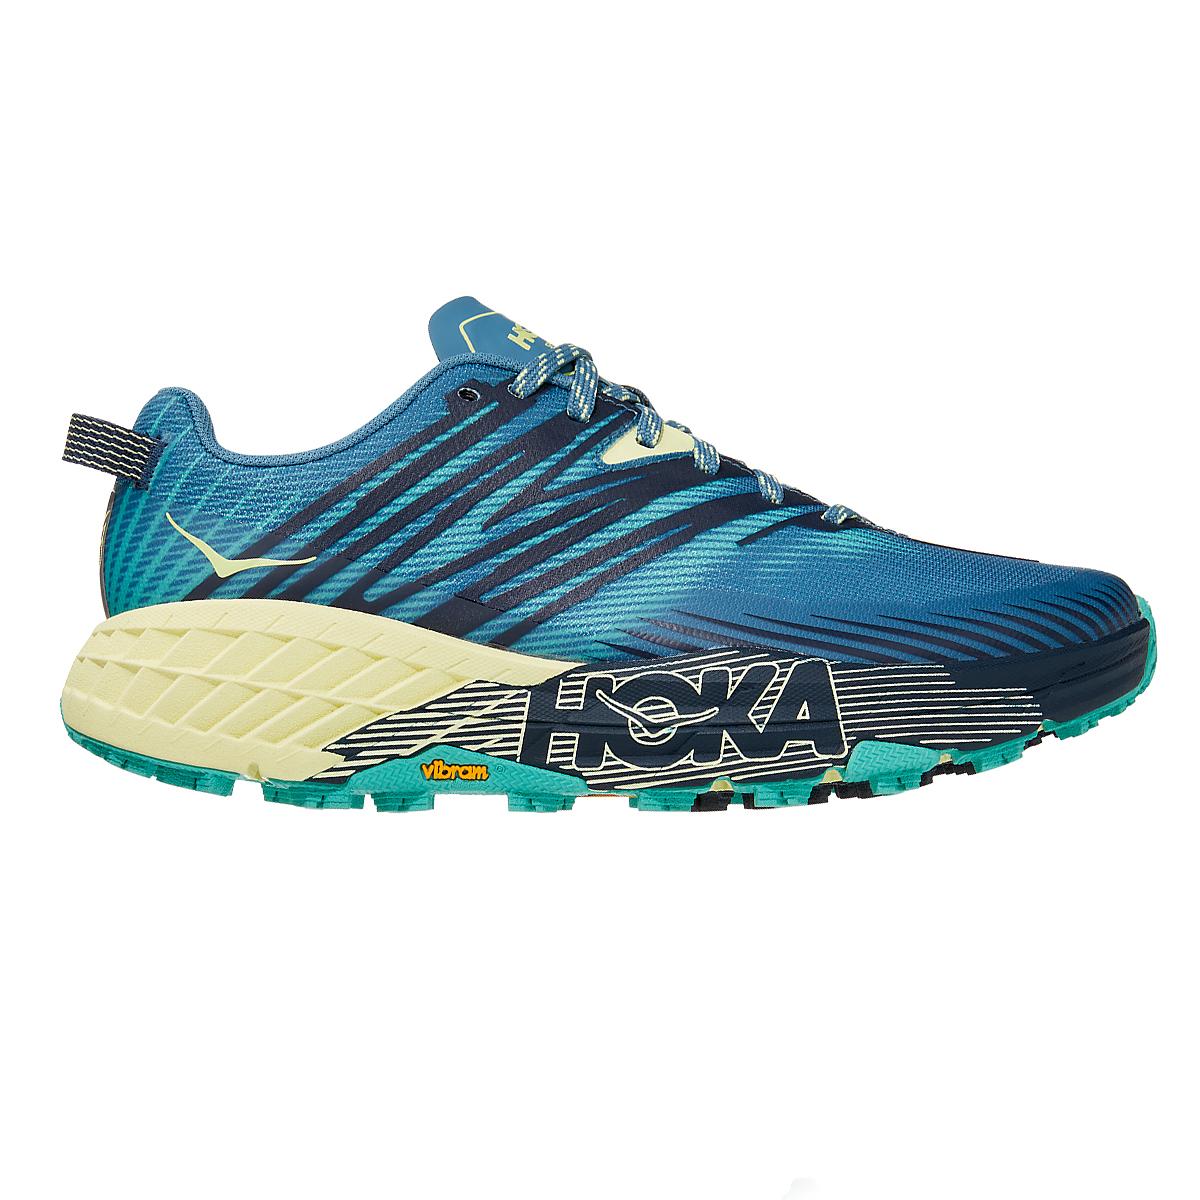 Women's Hoka One One Speedgoat 4 Running Shoe - Color: Provincial Blue/Luminary Green - Size: 5 - Width: Regular, Provincial Blue/Luminary Green, large, image 1